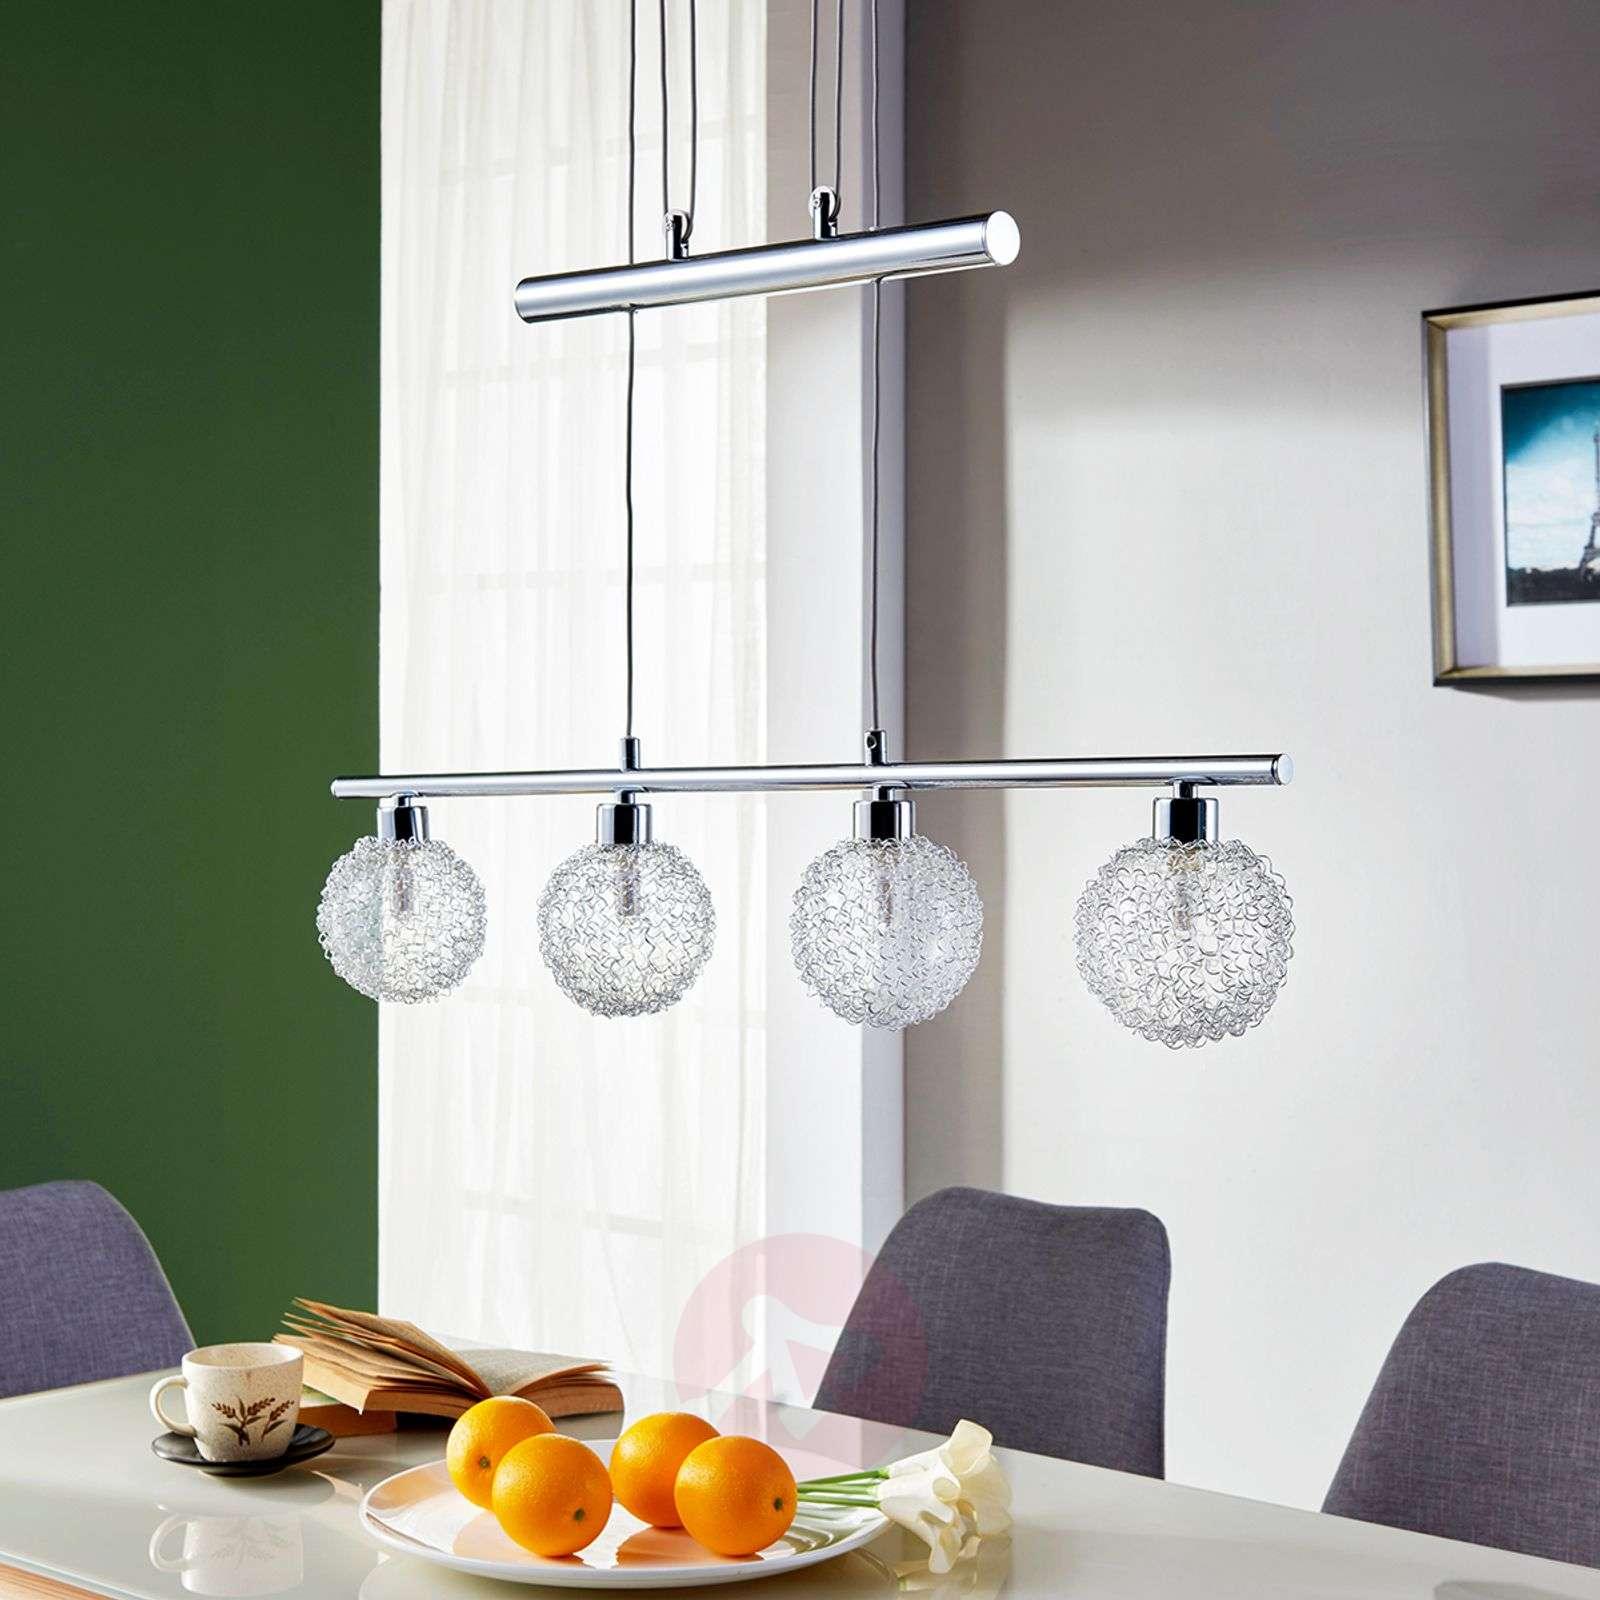 Height Adjustable Led Linear Pendant Lamp Ticino Lights Ie